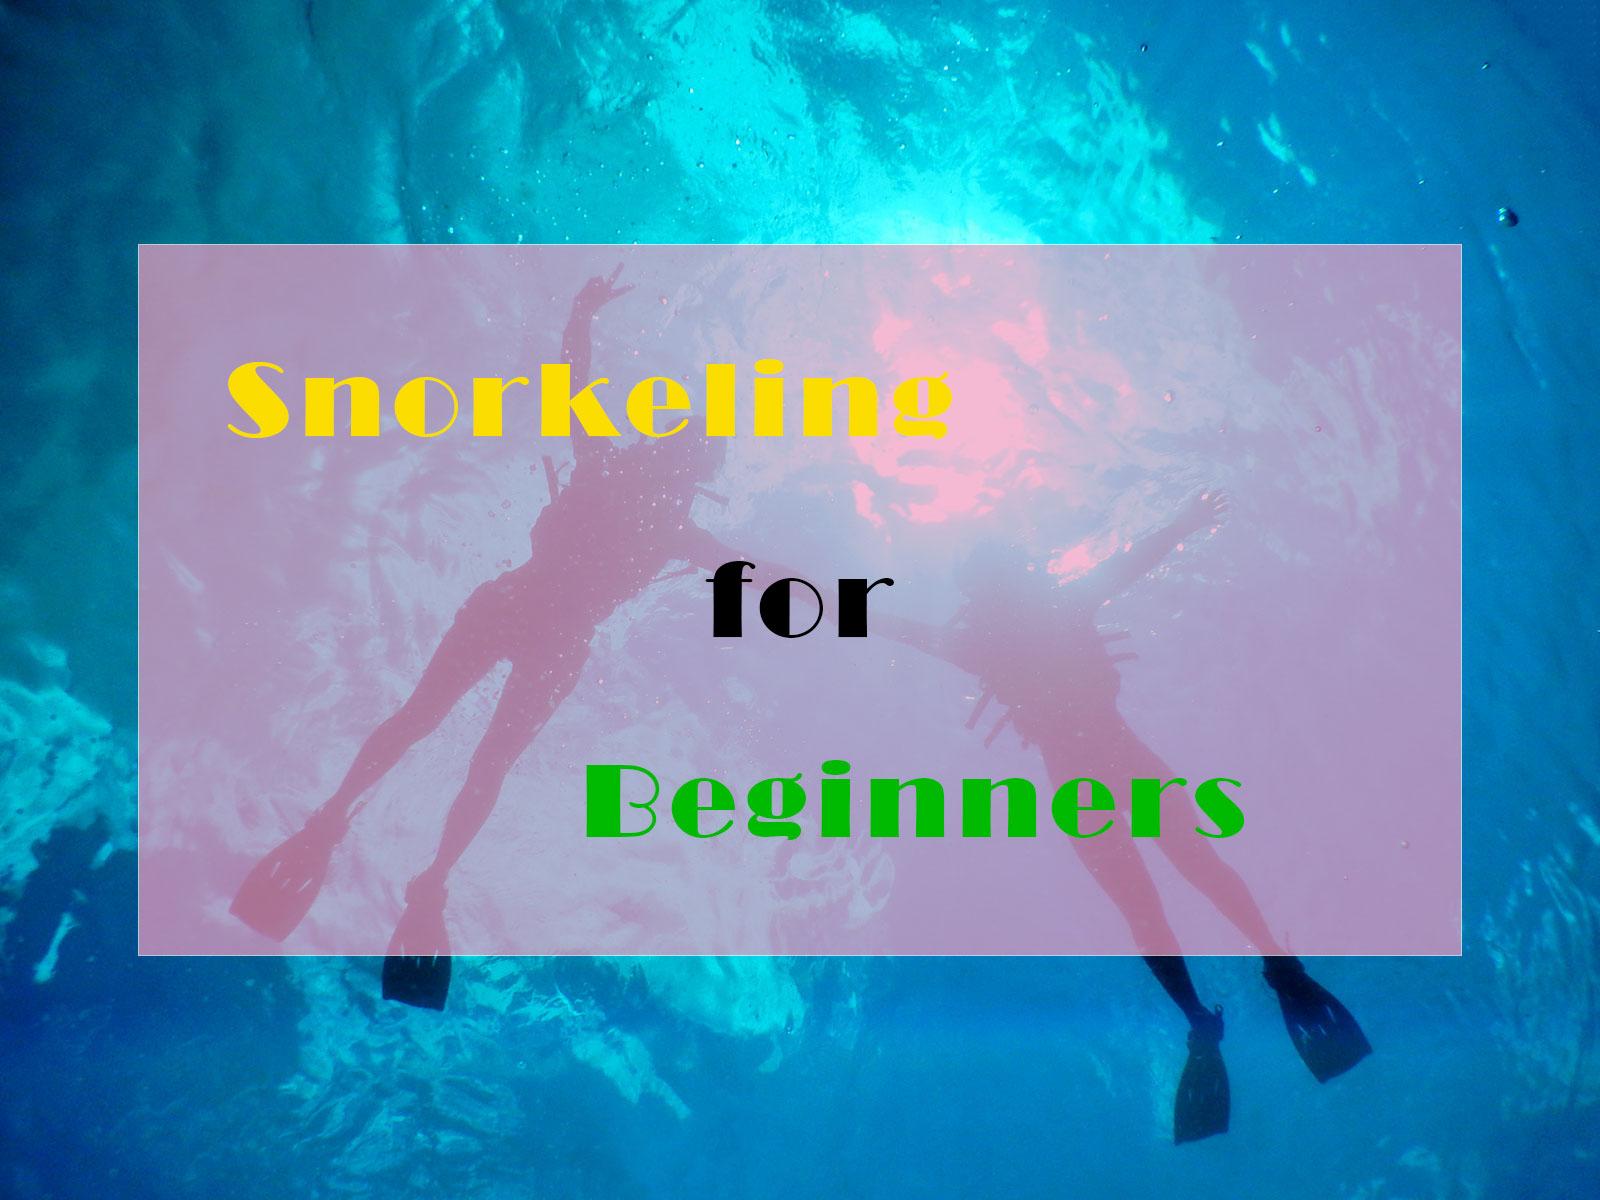 beginners-for-snorkeling